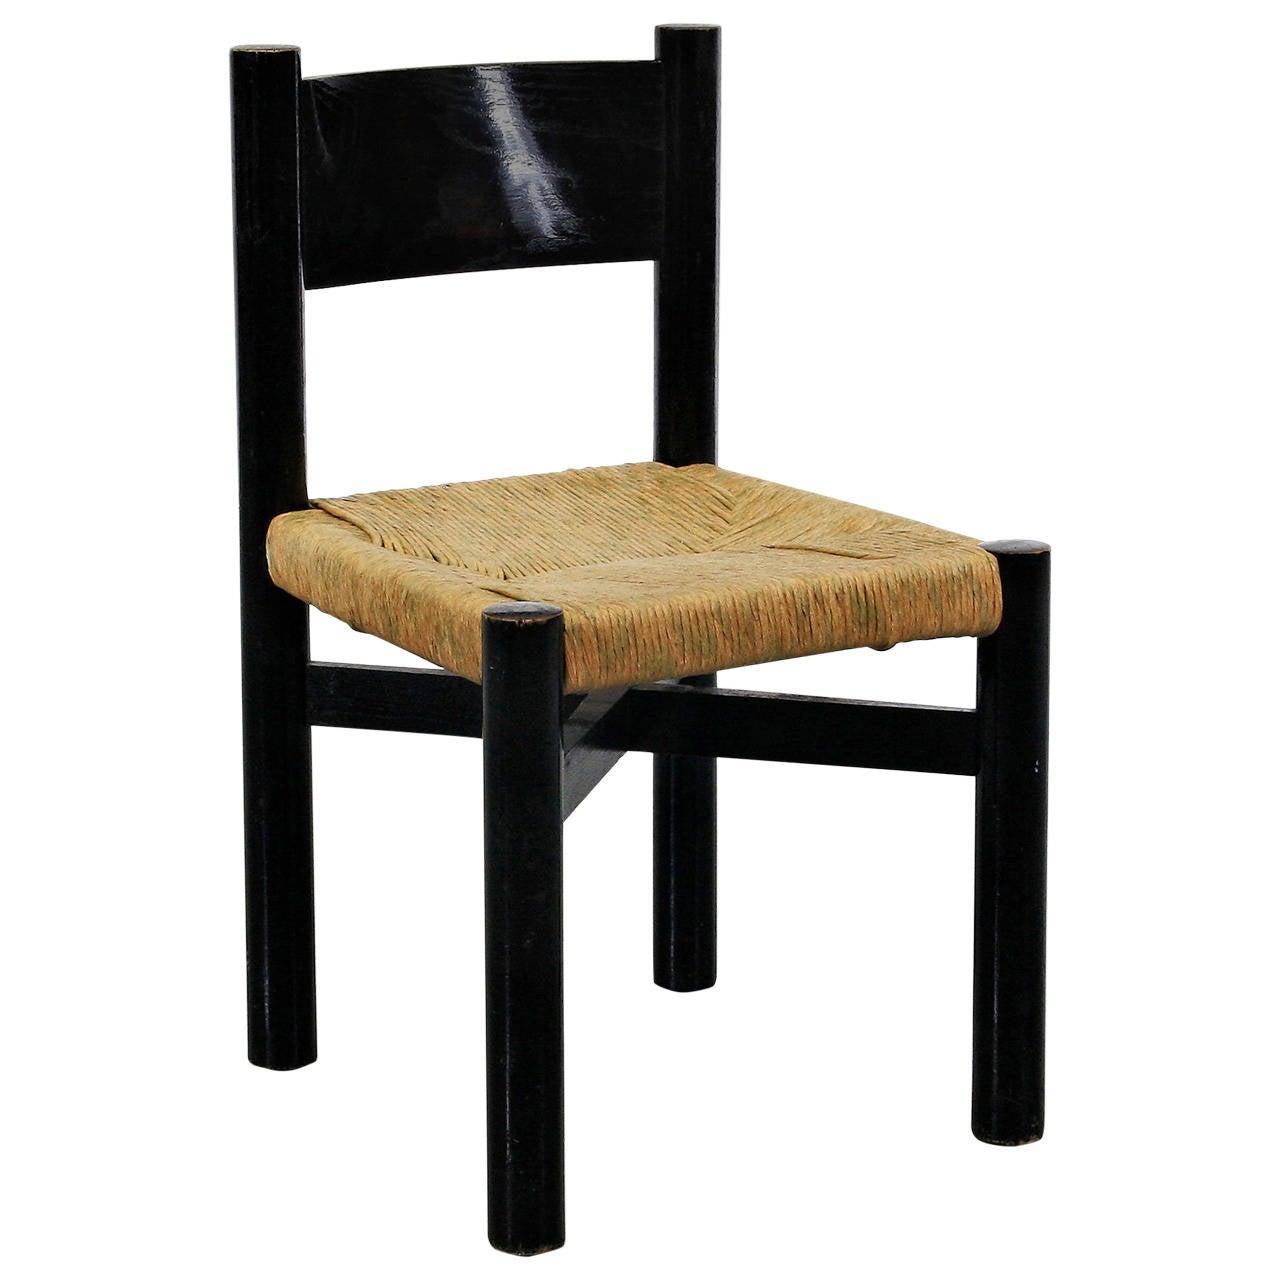 Rare Charlotte Perriand Low Meribel Chair, circa 1950